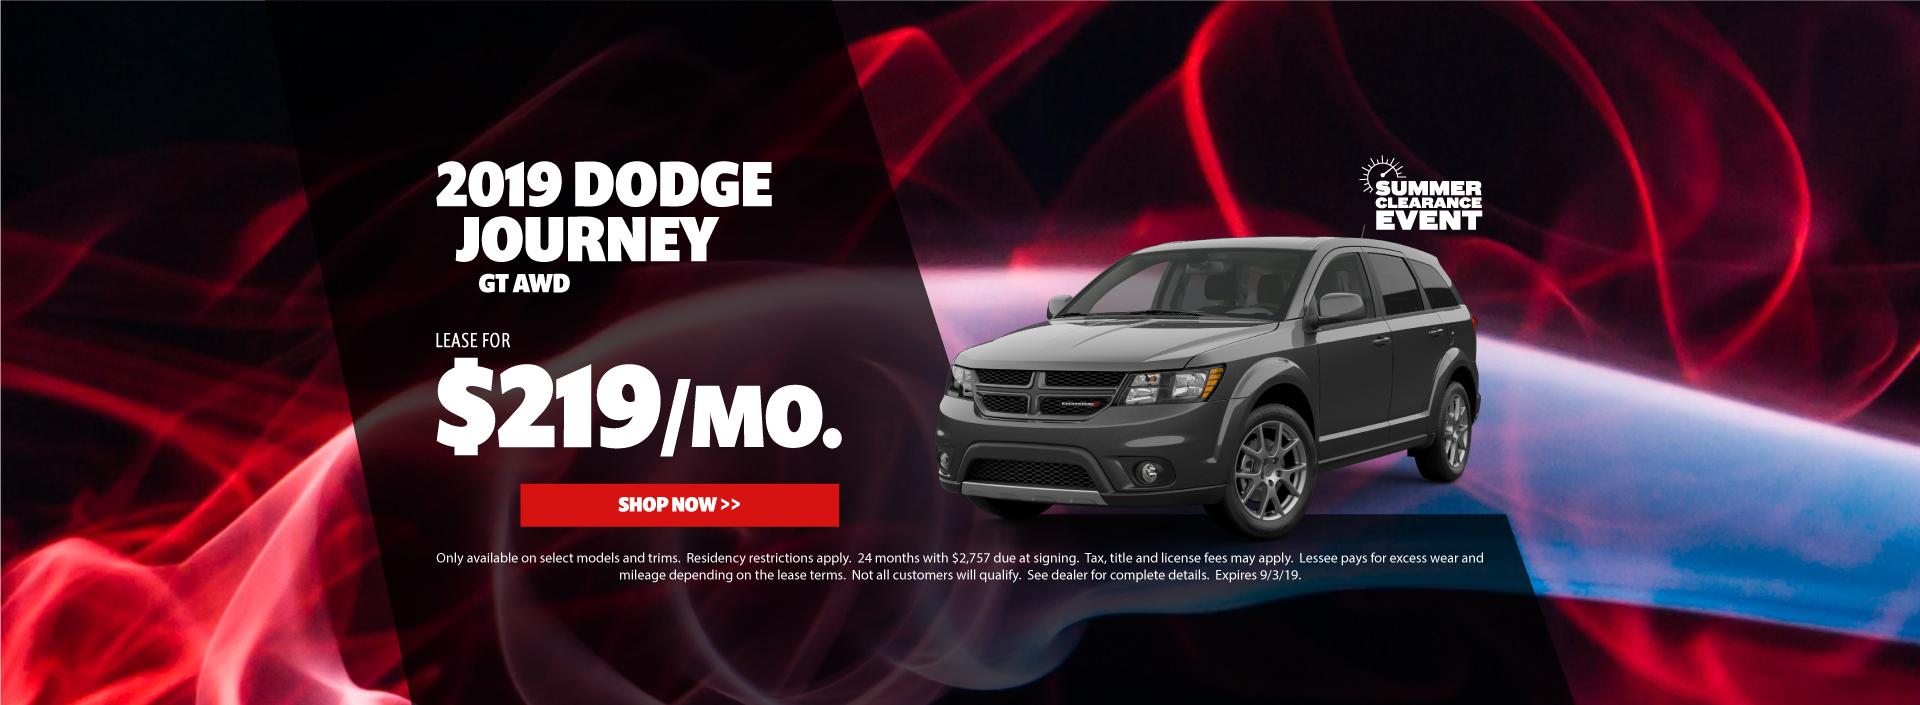 2019 Dodge Journey Special